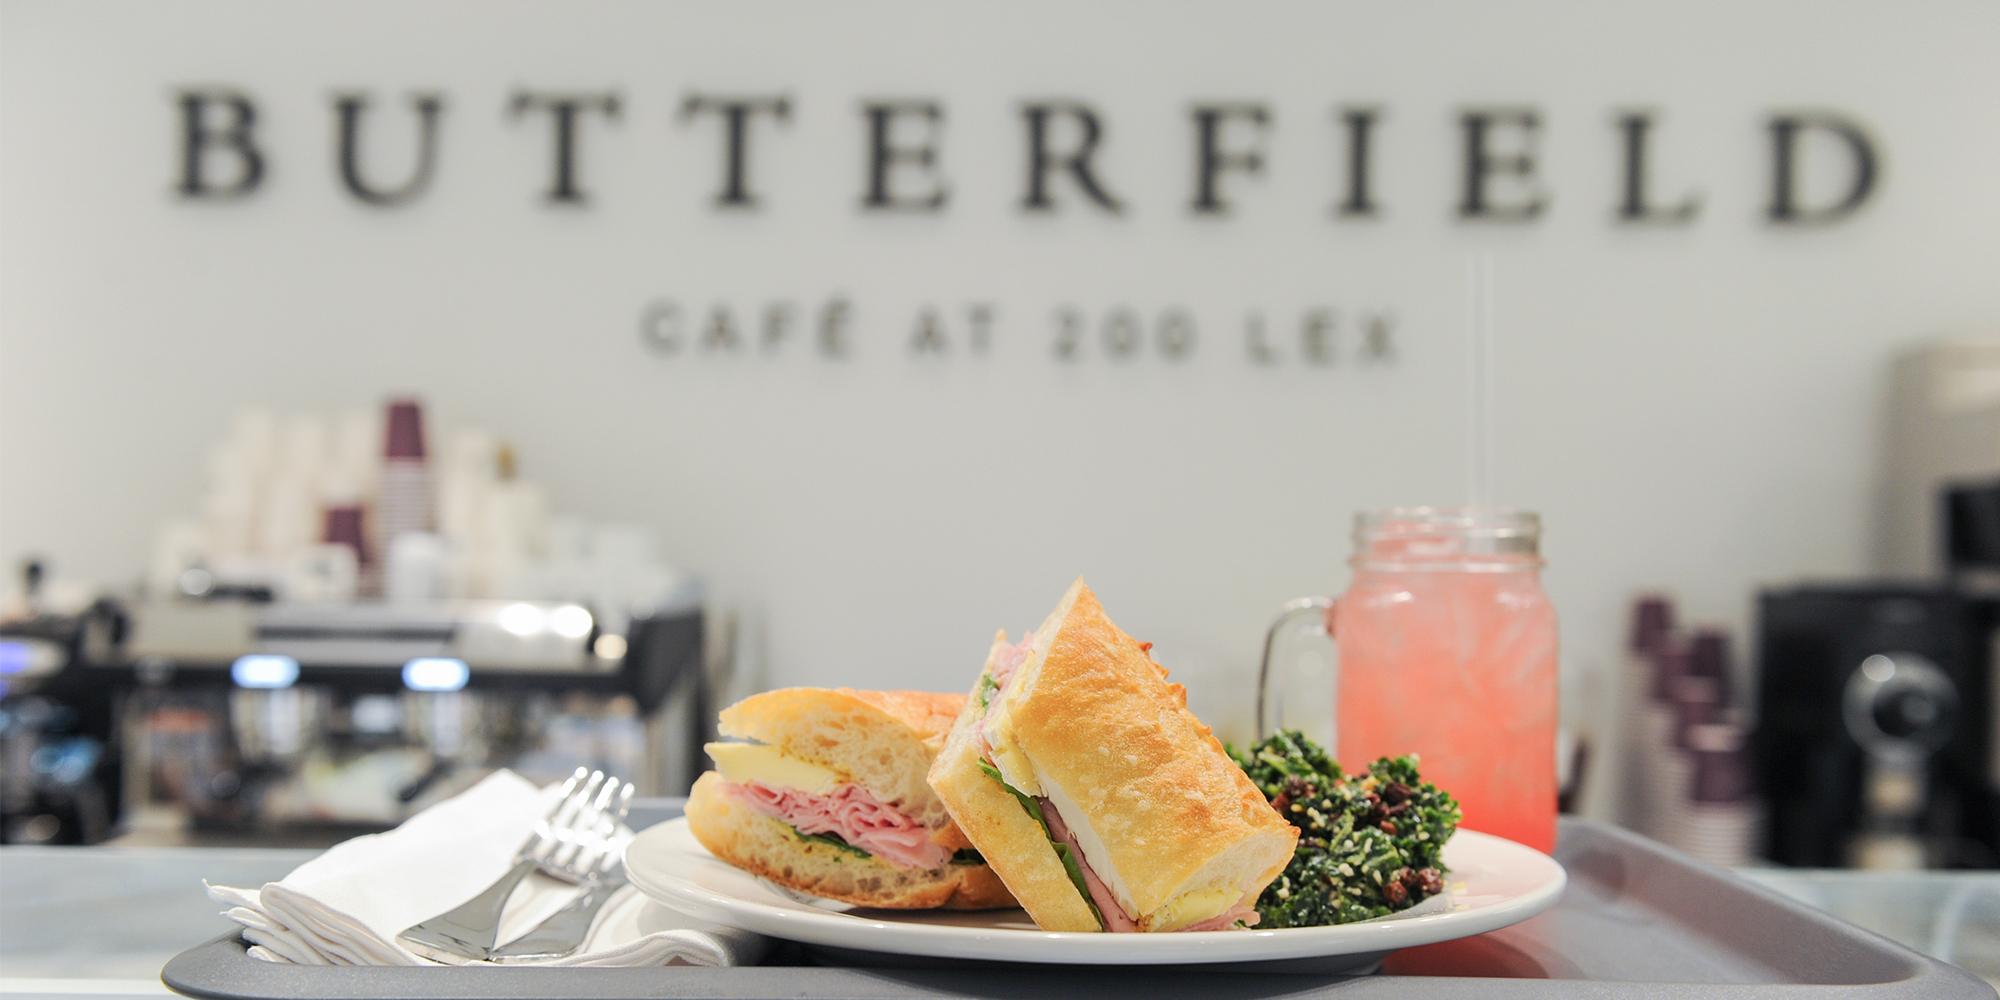 Butterfield Cafe Food Homepage Header_Web